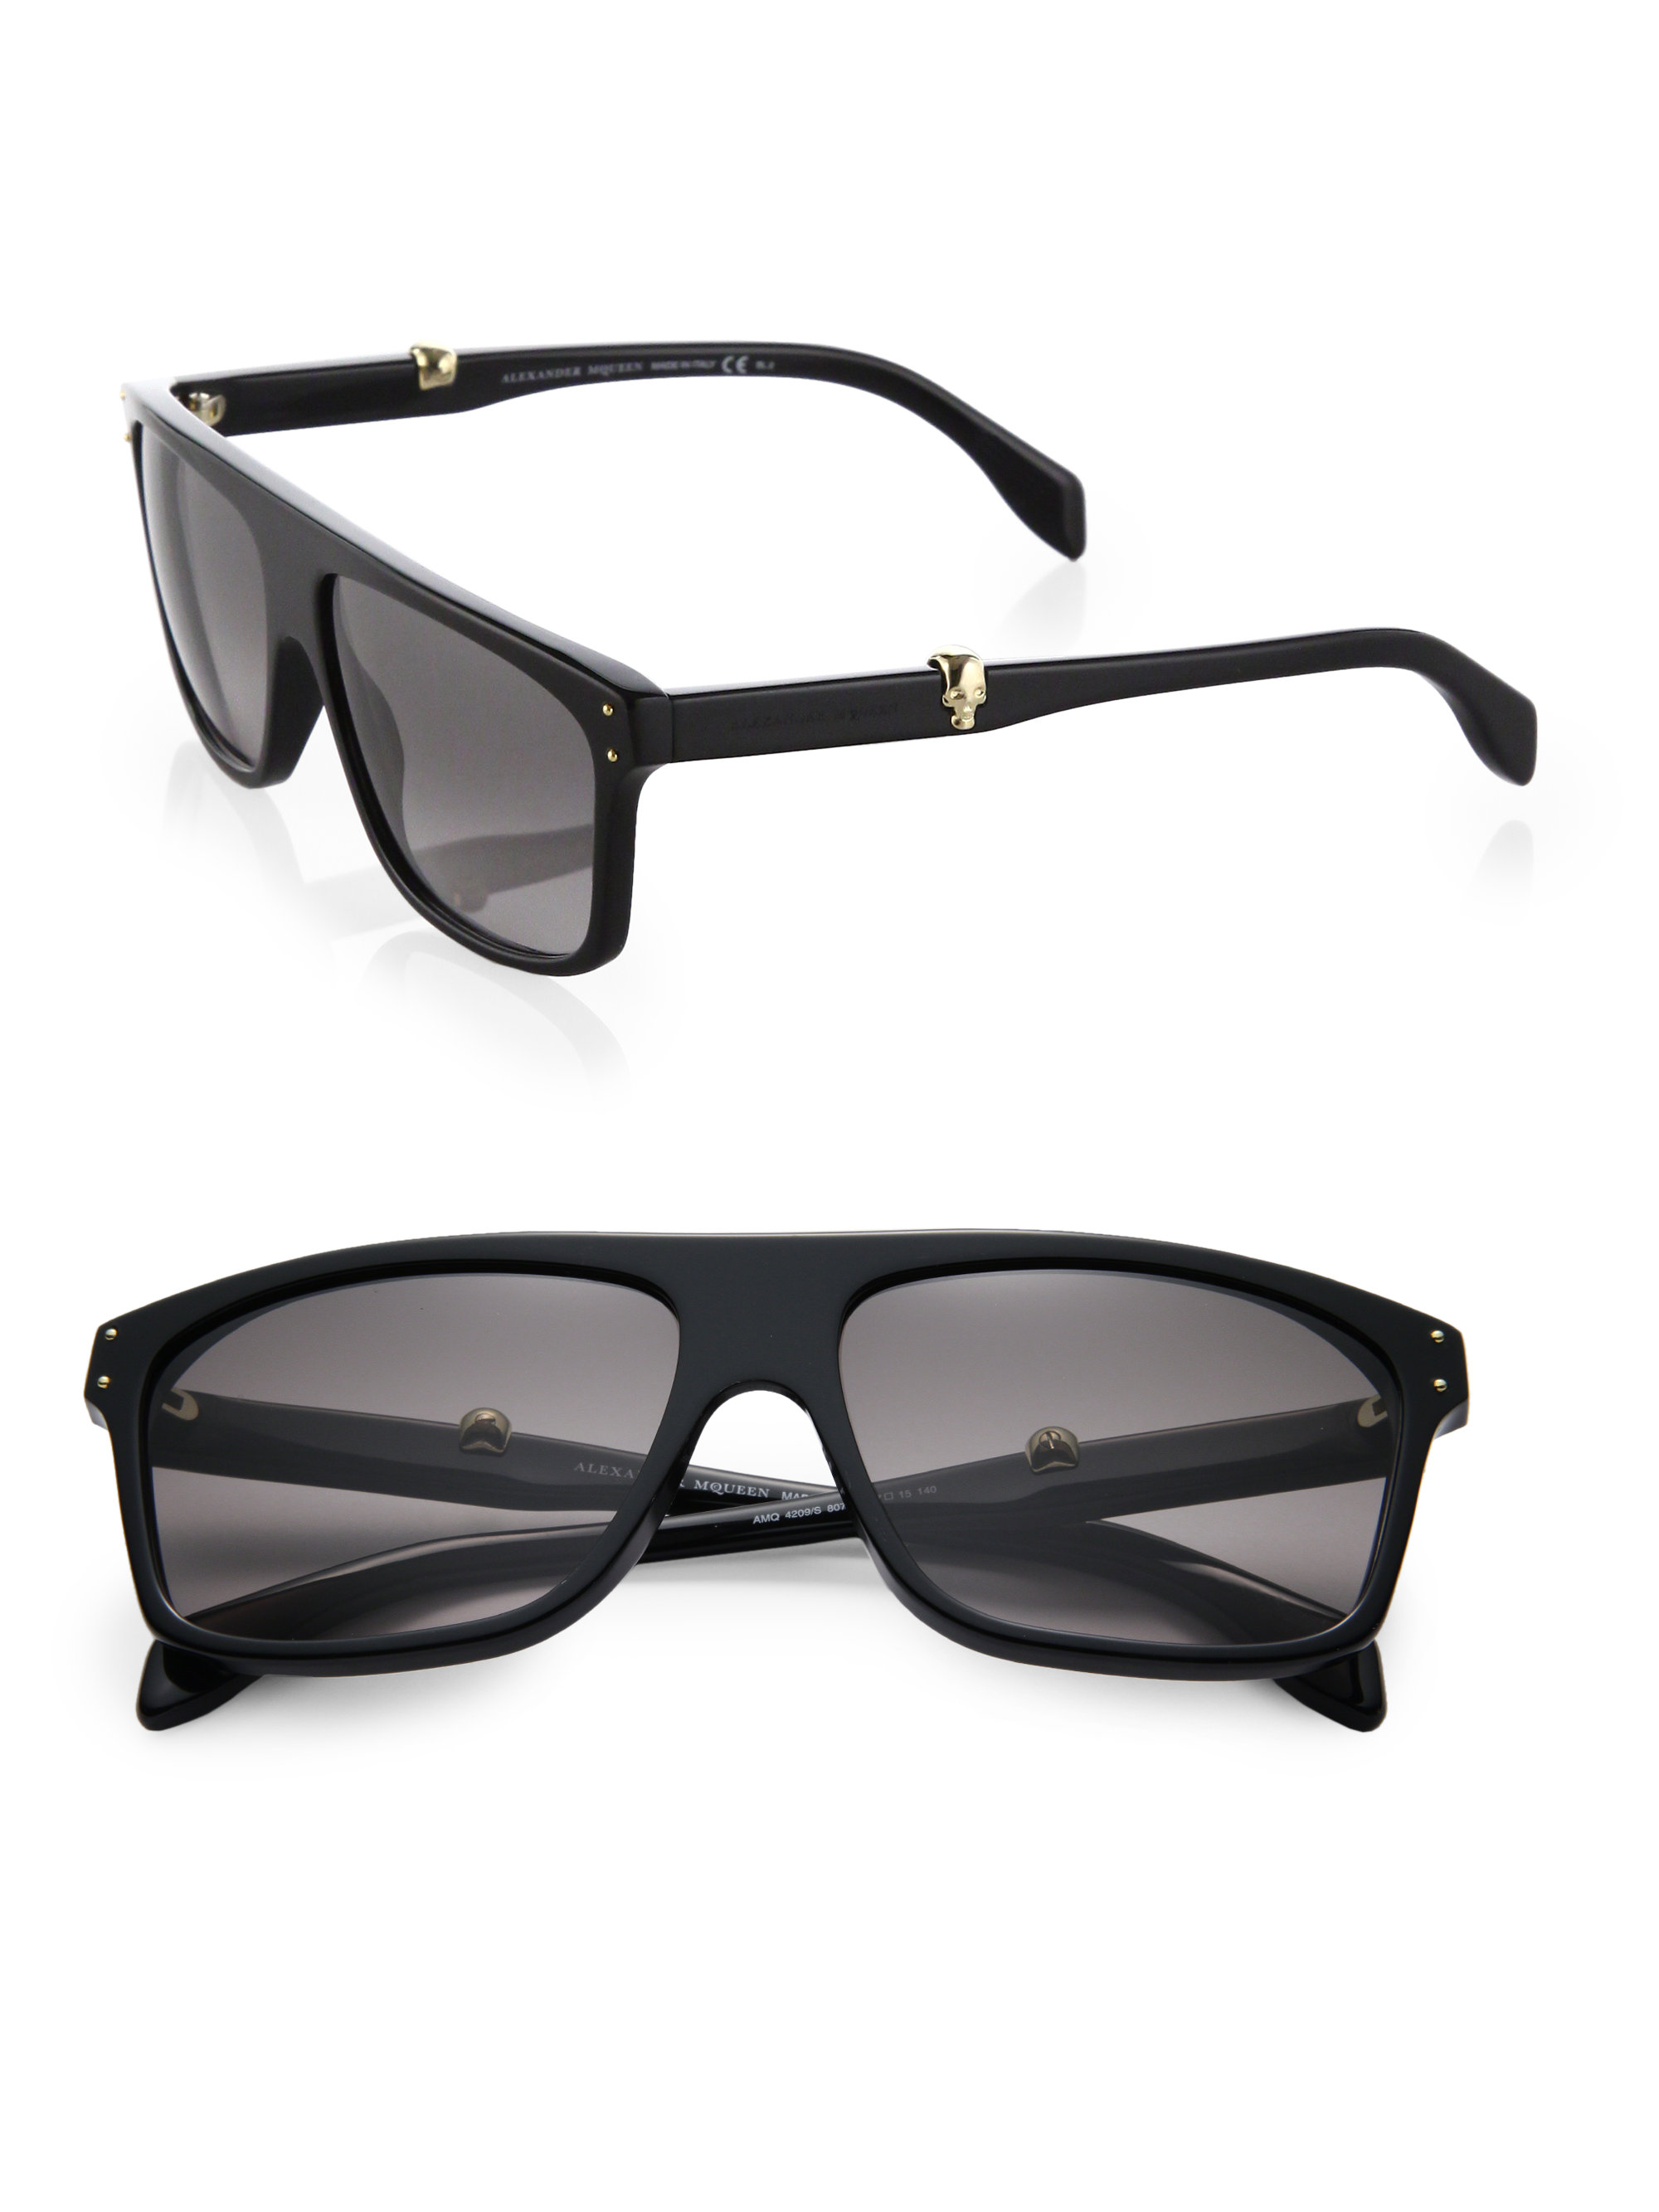 Alexander Mcqueen Sunglasses  alexander mcqueen skull wayfarer acetate sunglasses in black for